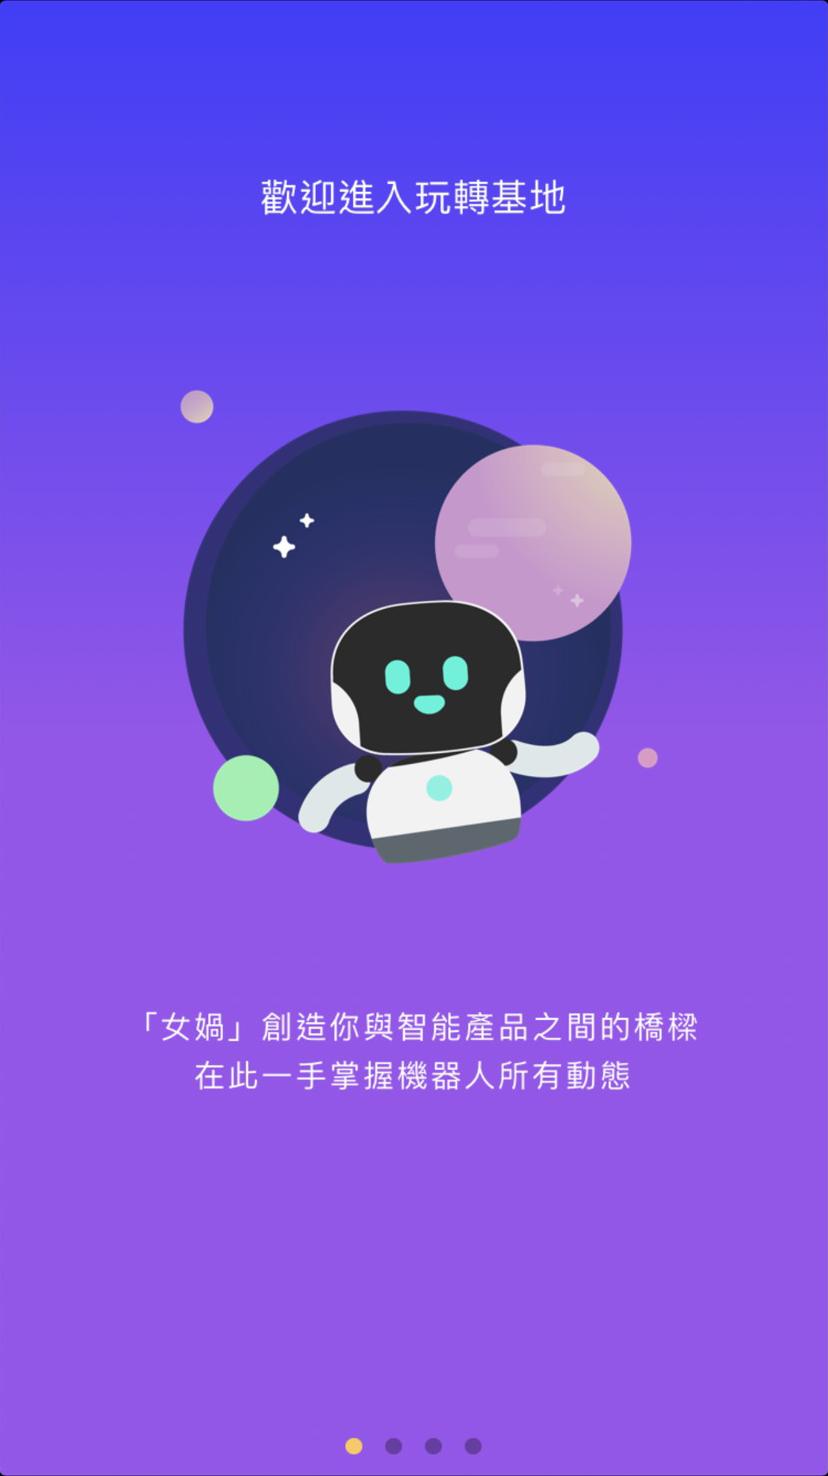 NUWASpace_Login-1